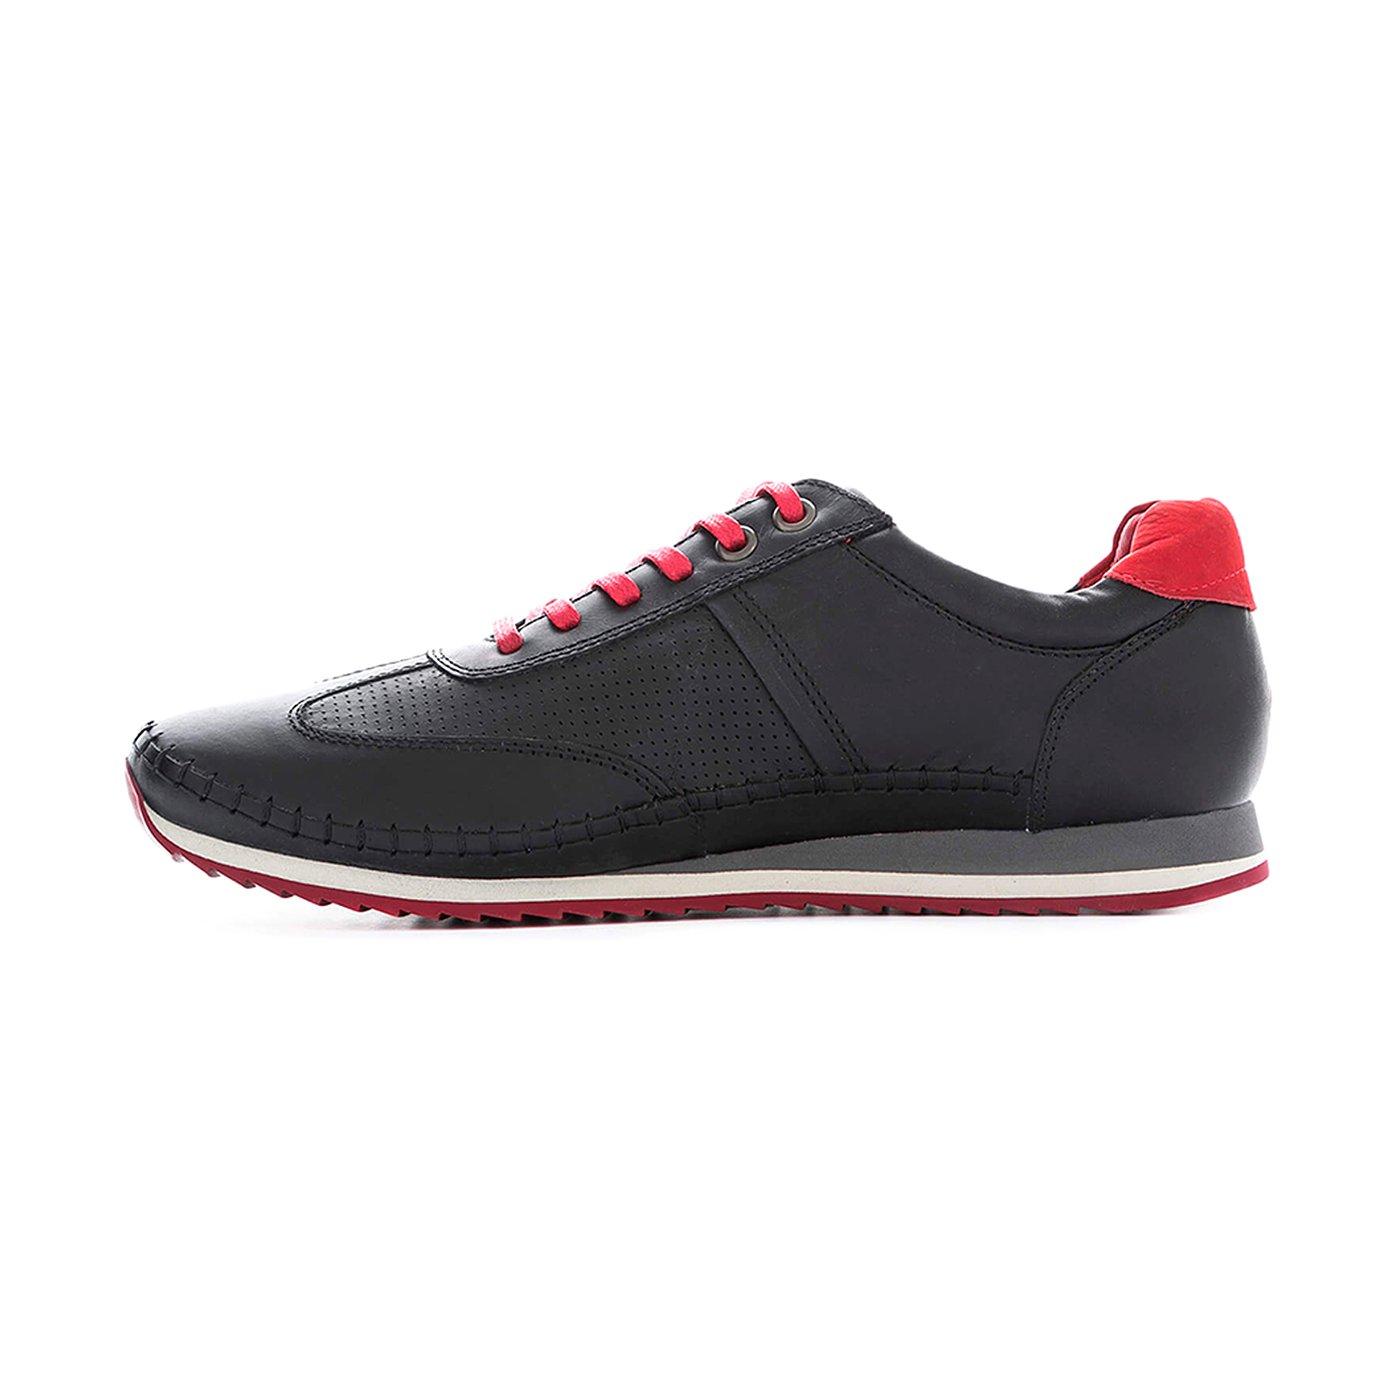 Amazon.com: VELEZ Mens Genuine Colombian Leather Sneakers | Zapatos Deportivos Cuero Hombre: Clothing